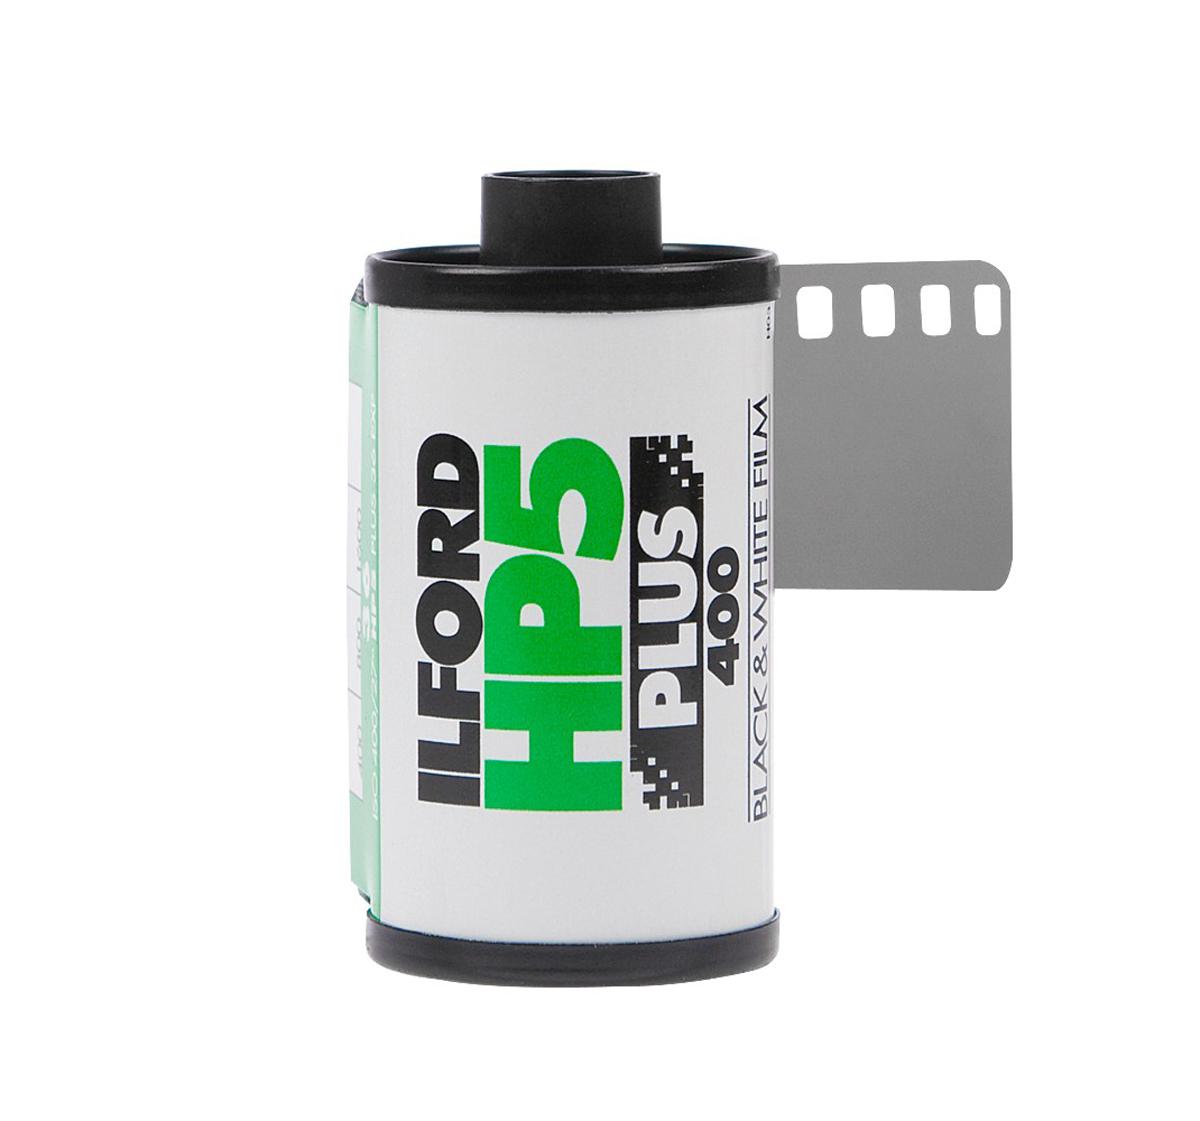 HP5 Plus 400 B&W Negative Film, 135mm, 24 Exposures, Single Roll